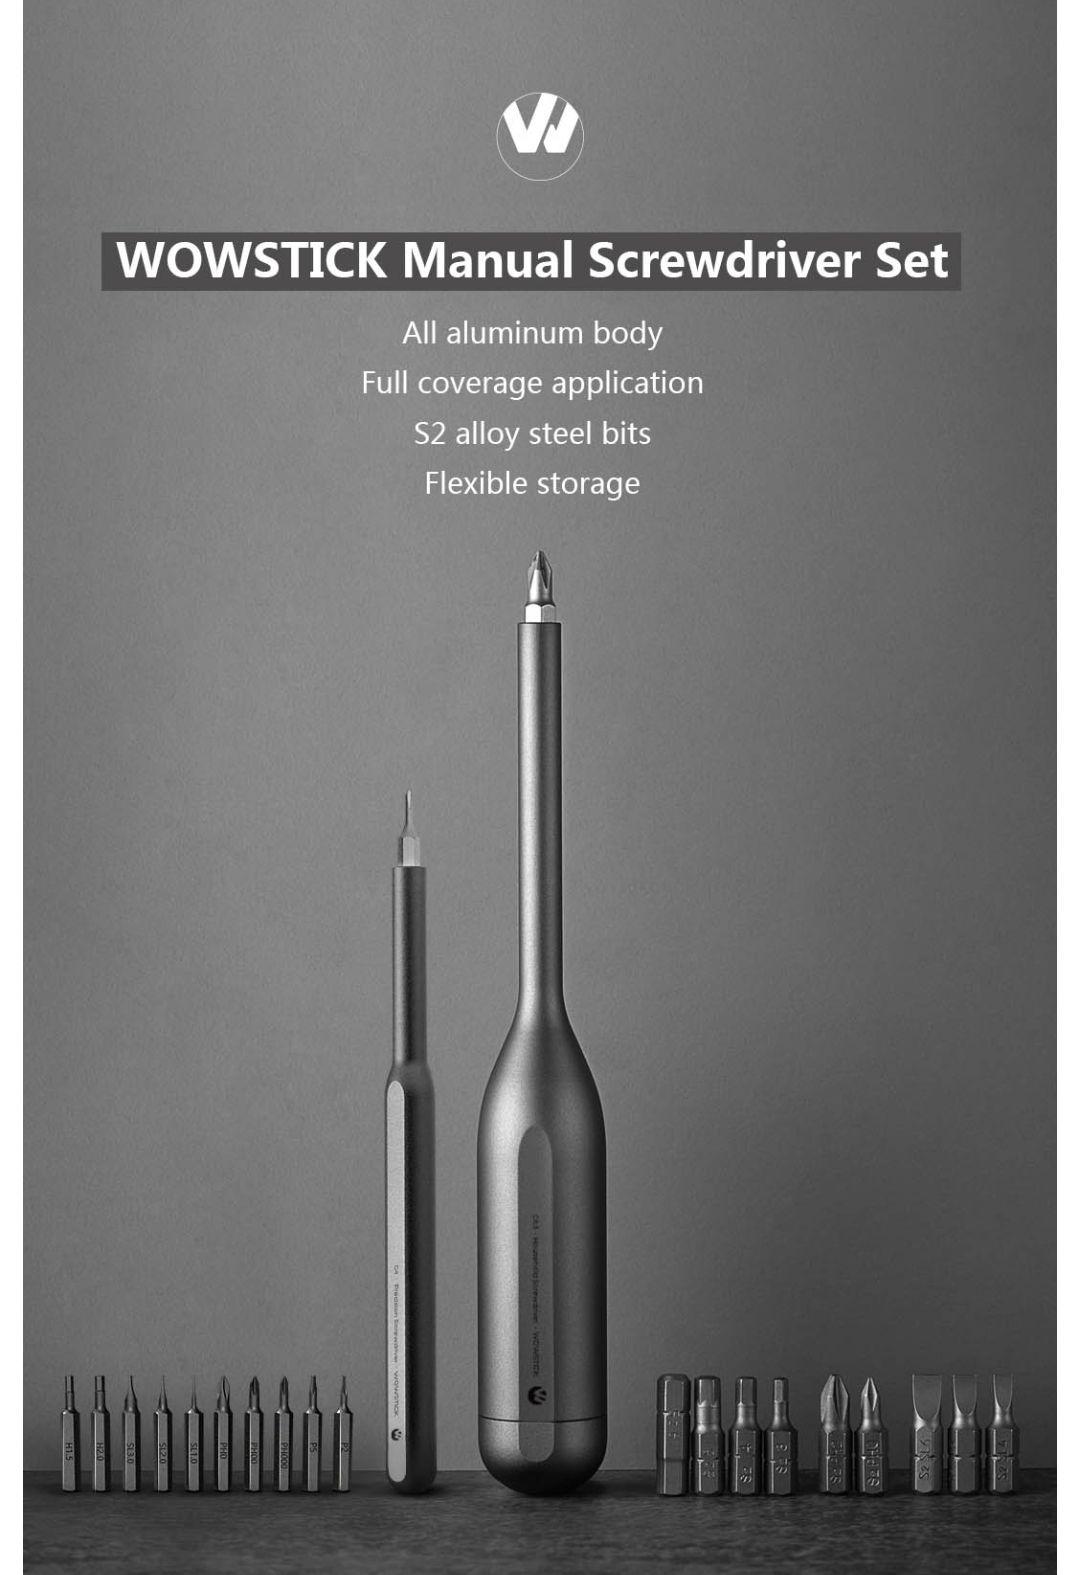 Wowstick 22 in 1 schroevendraaier set